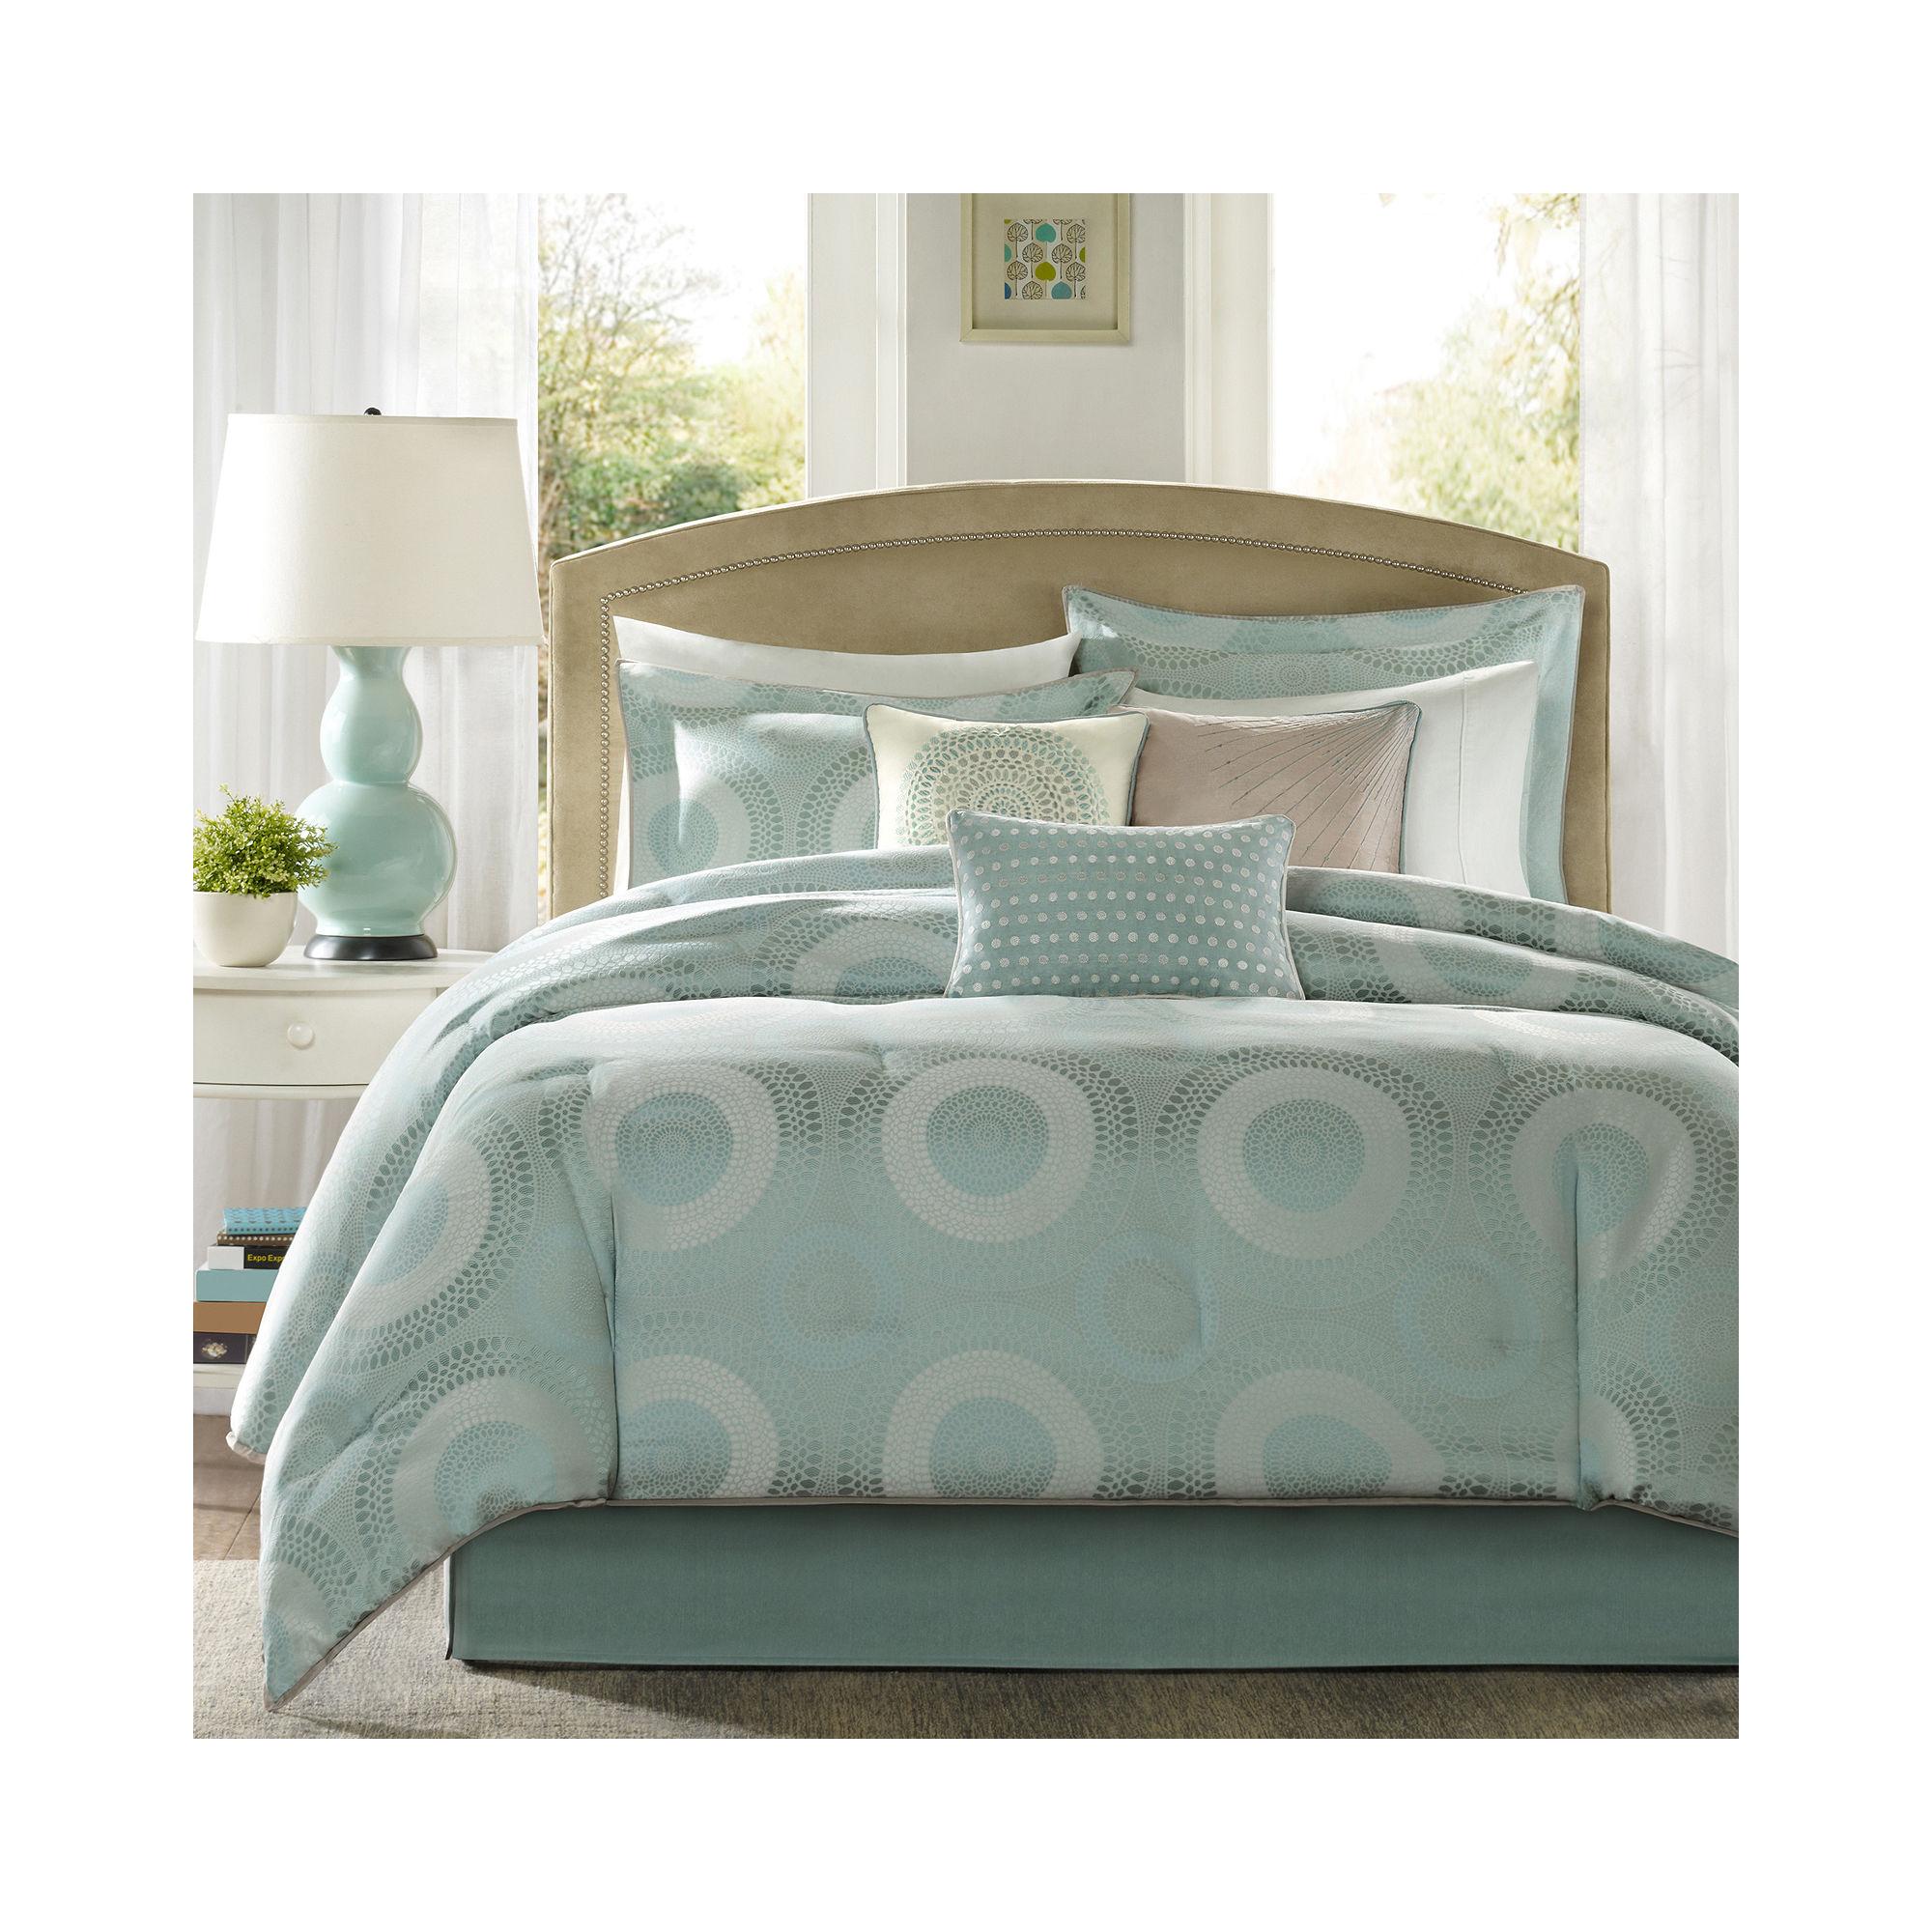 cheap madison park mason 7 pc comforter set limited bedding sets